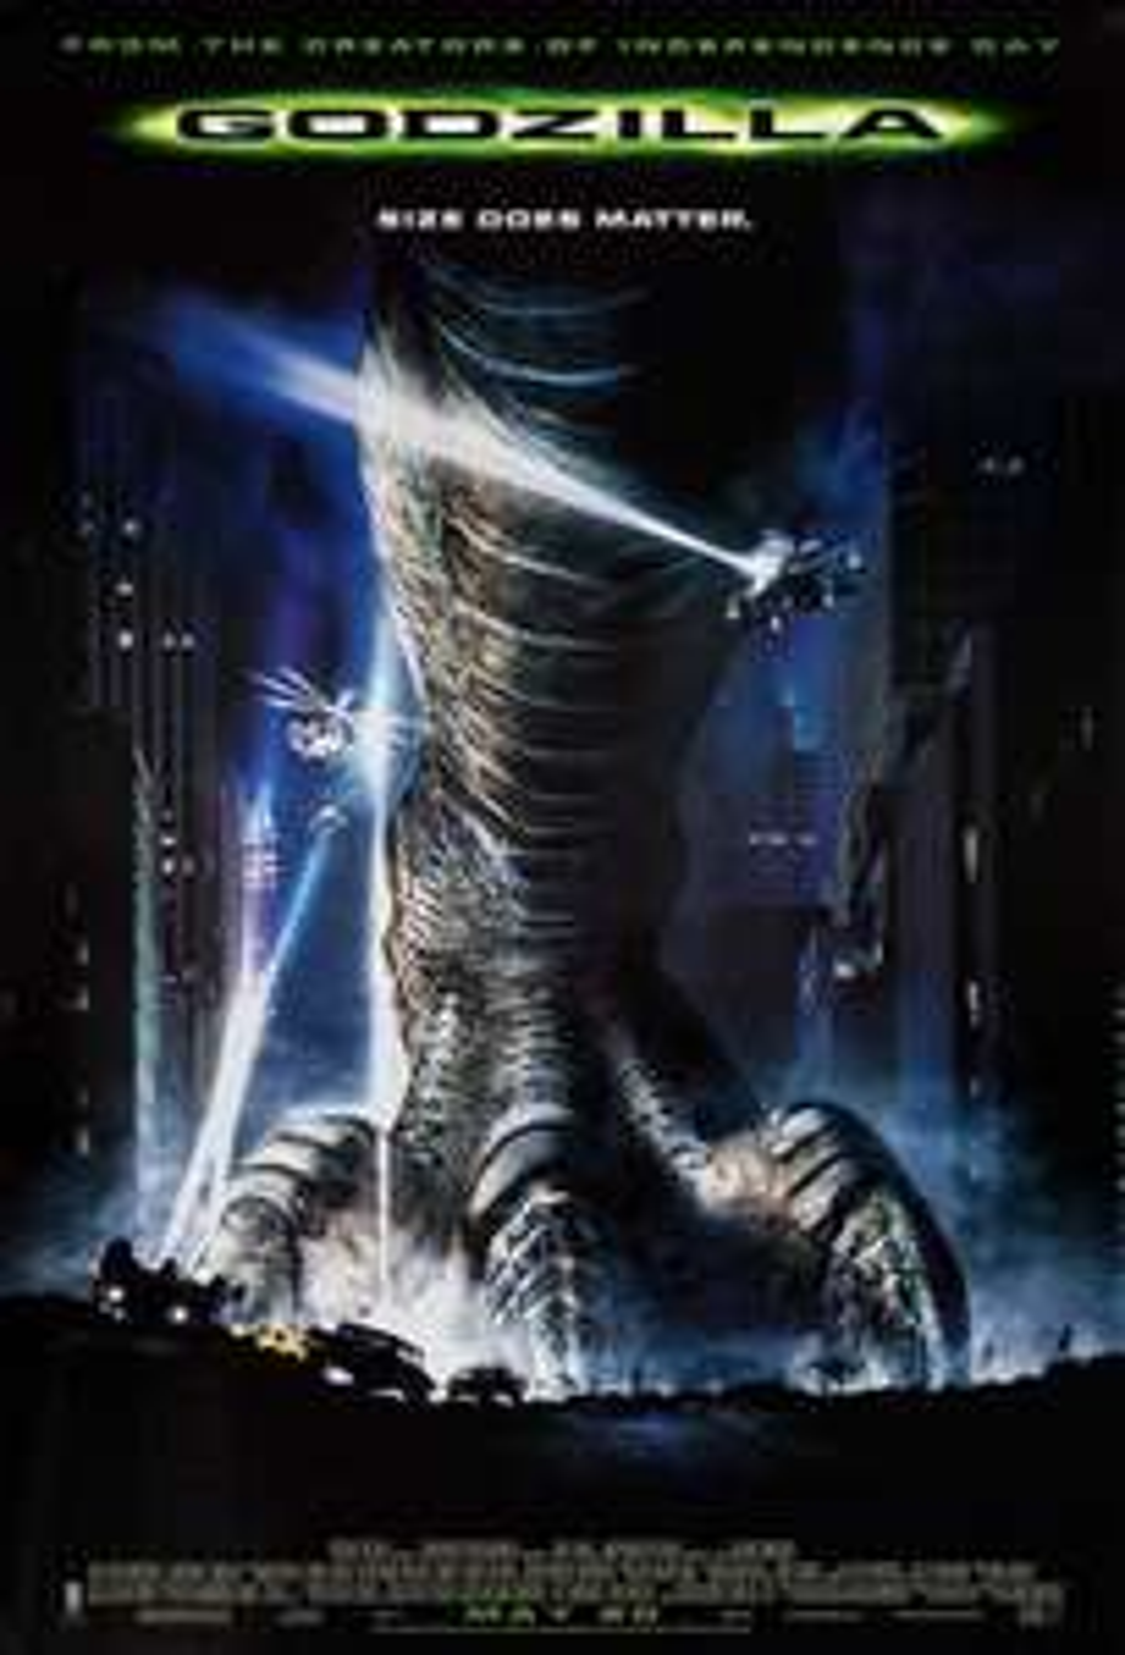 [iTunes] Godzilla (1998) 4K Dolby Vision Dolby Atmos